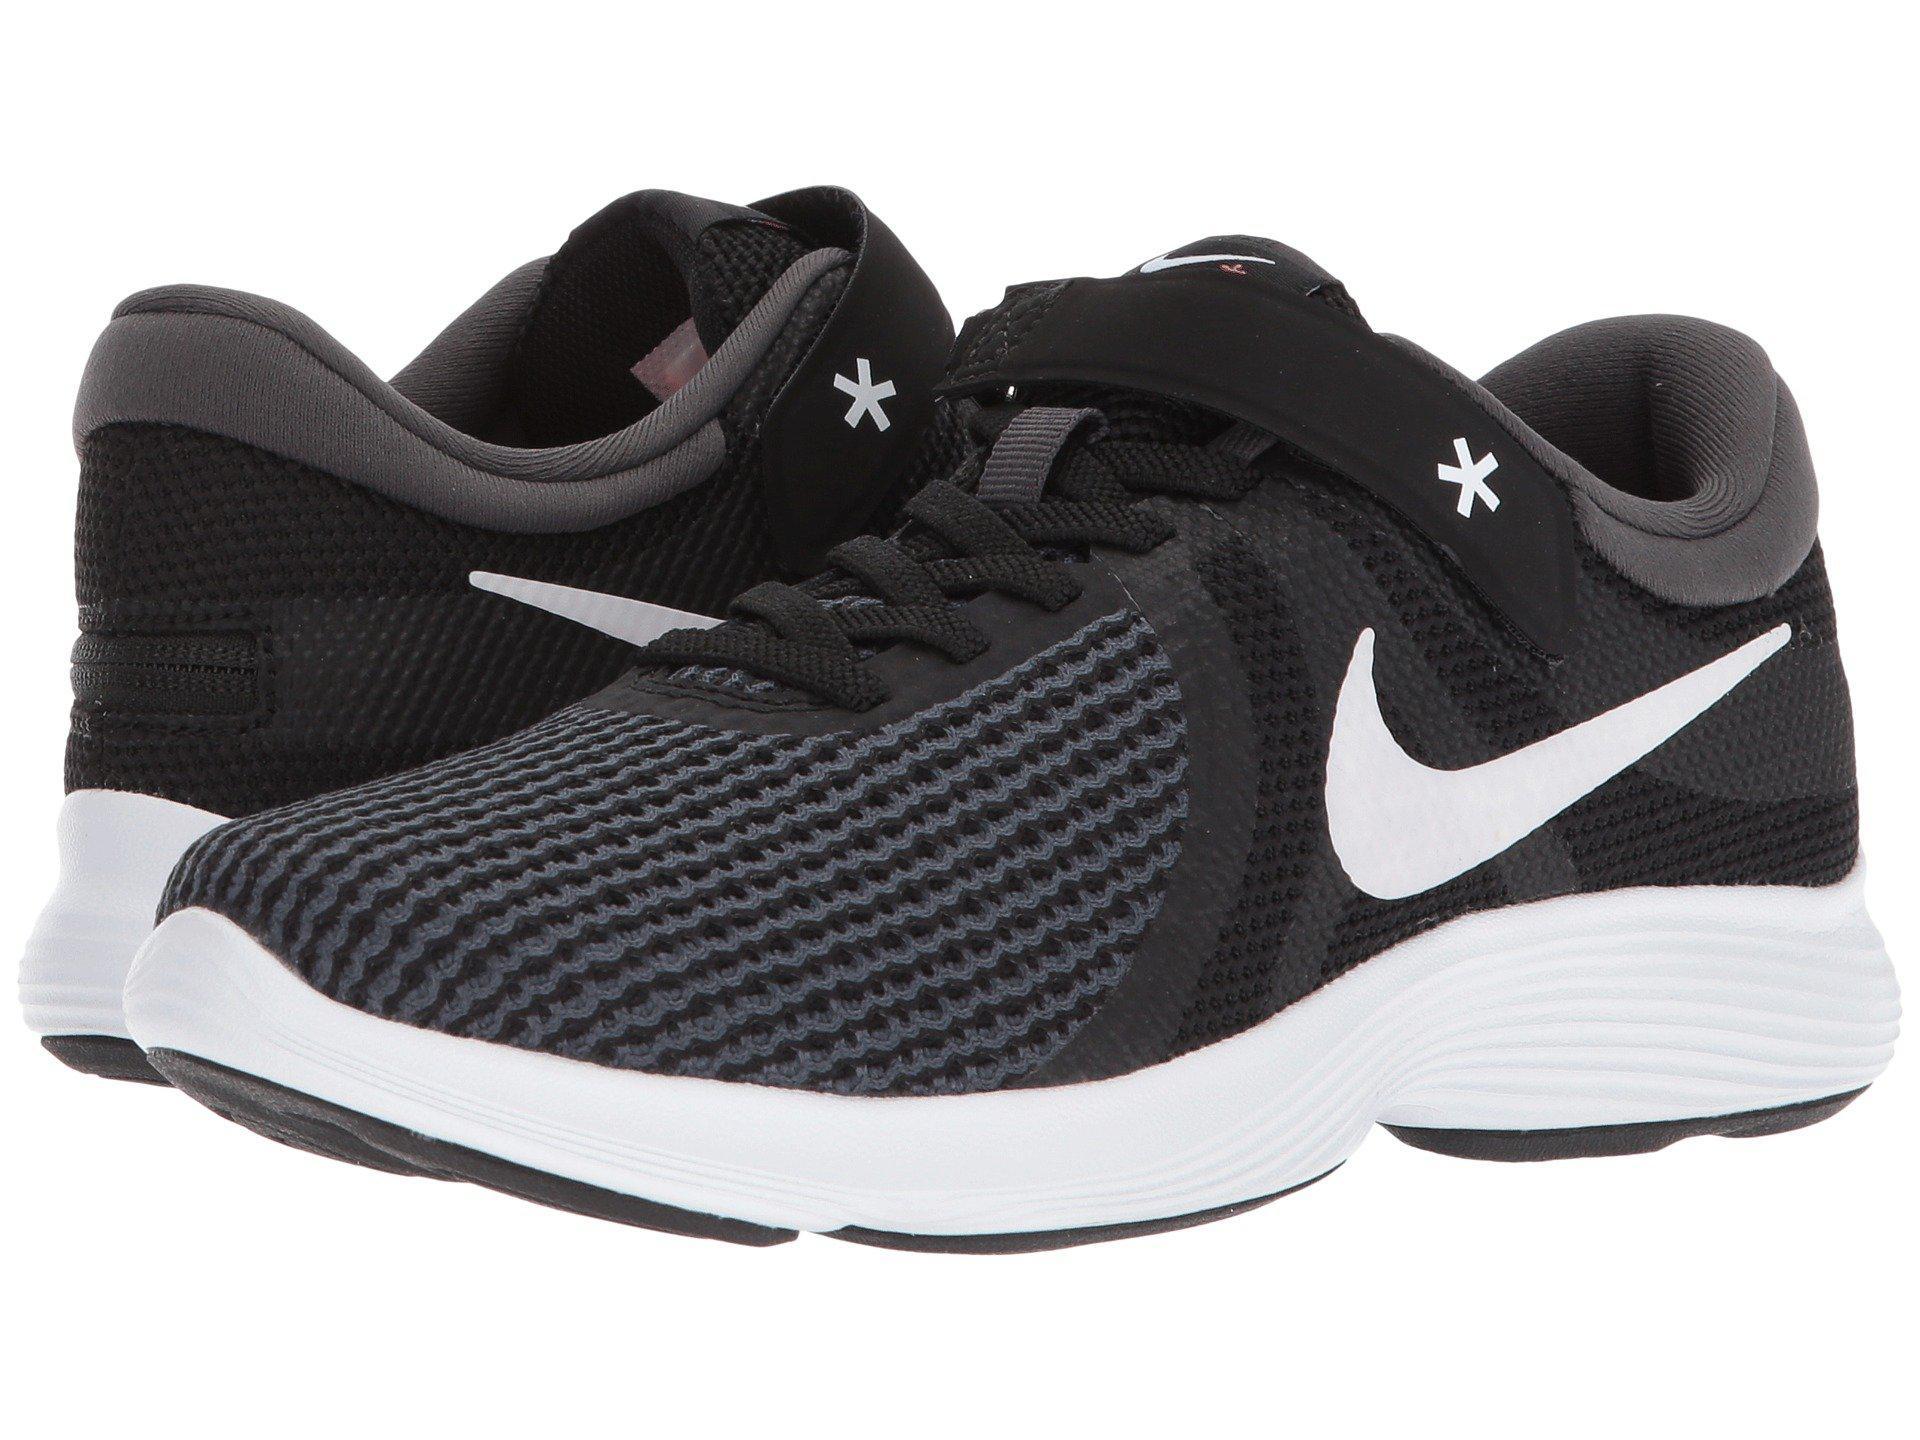 f8814342b74 ... Lyst - Nike Revolution 4 Flyease in Black for Men ...